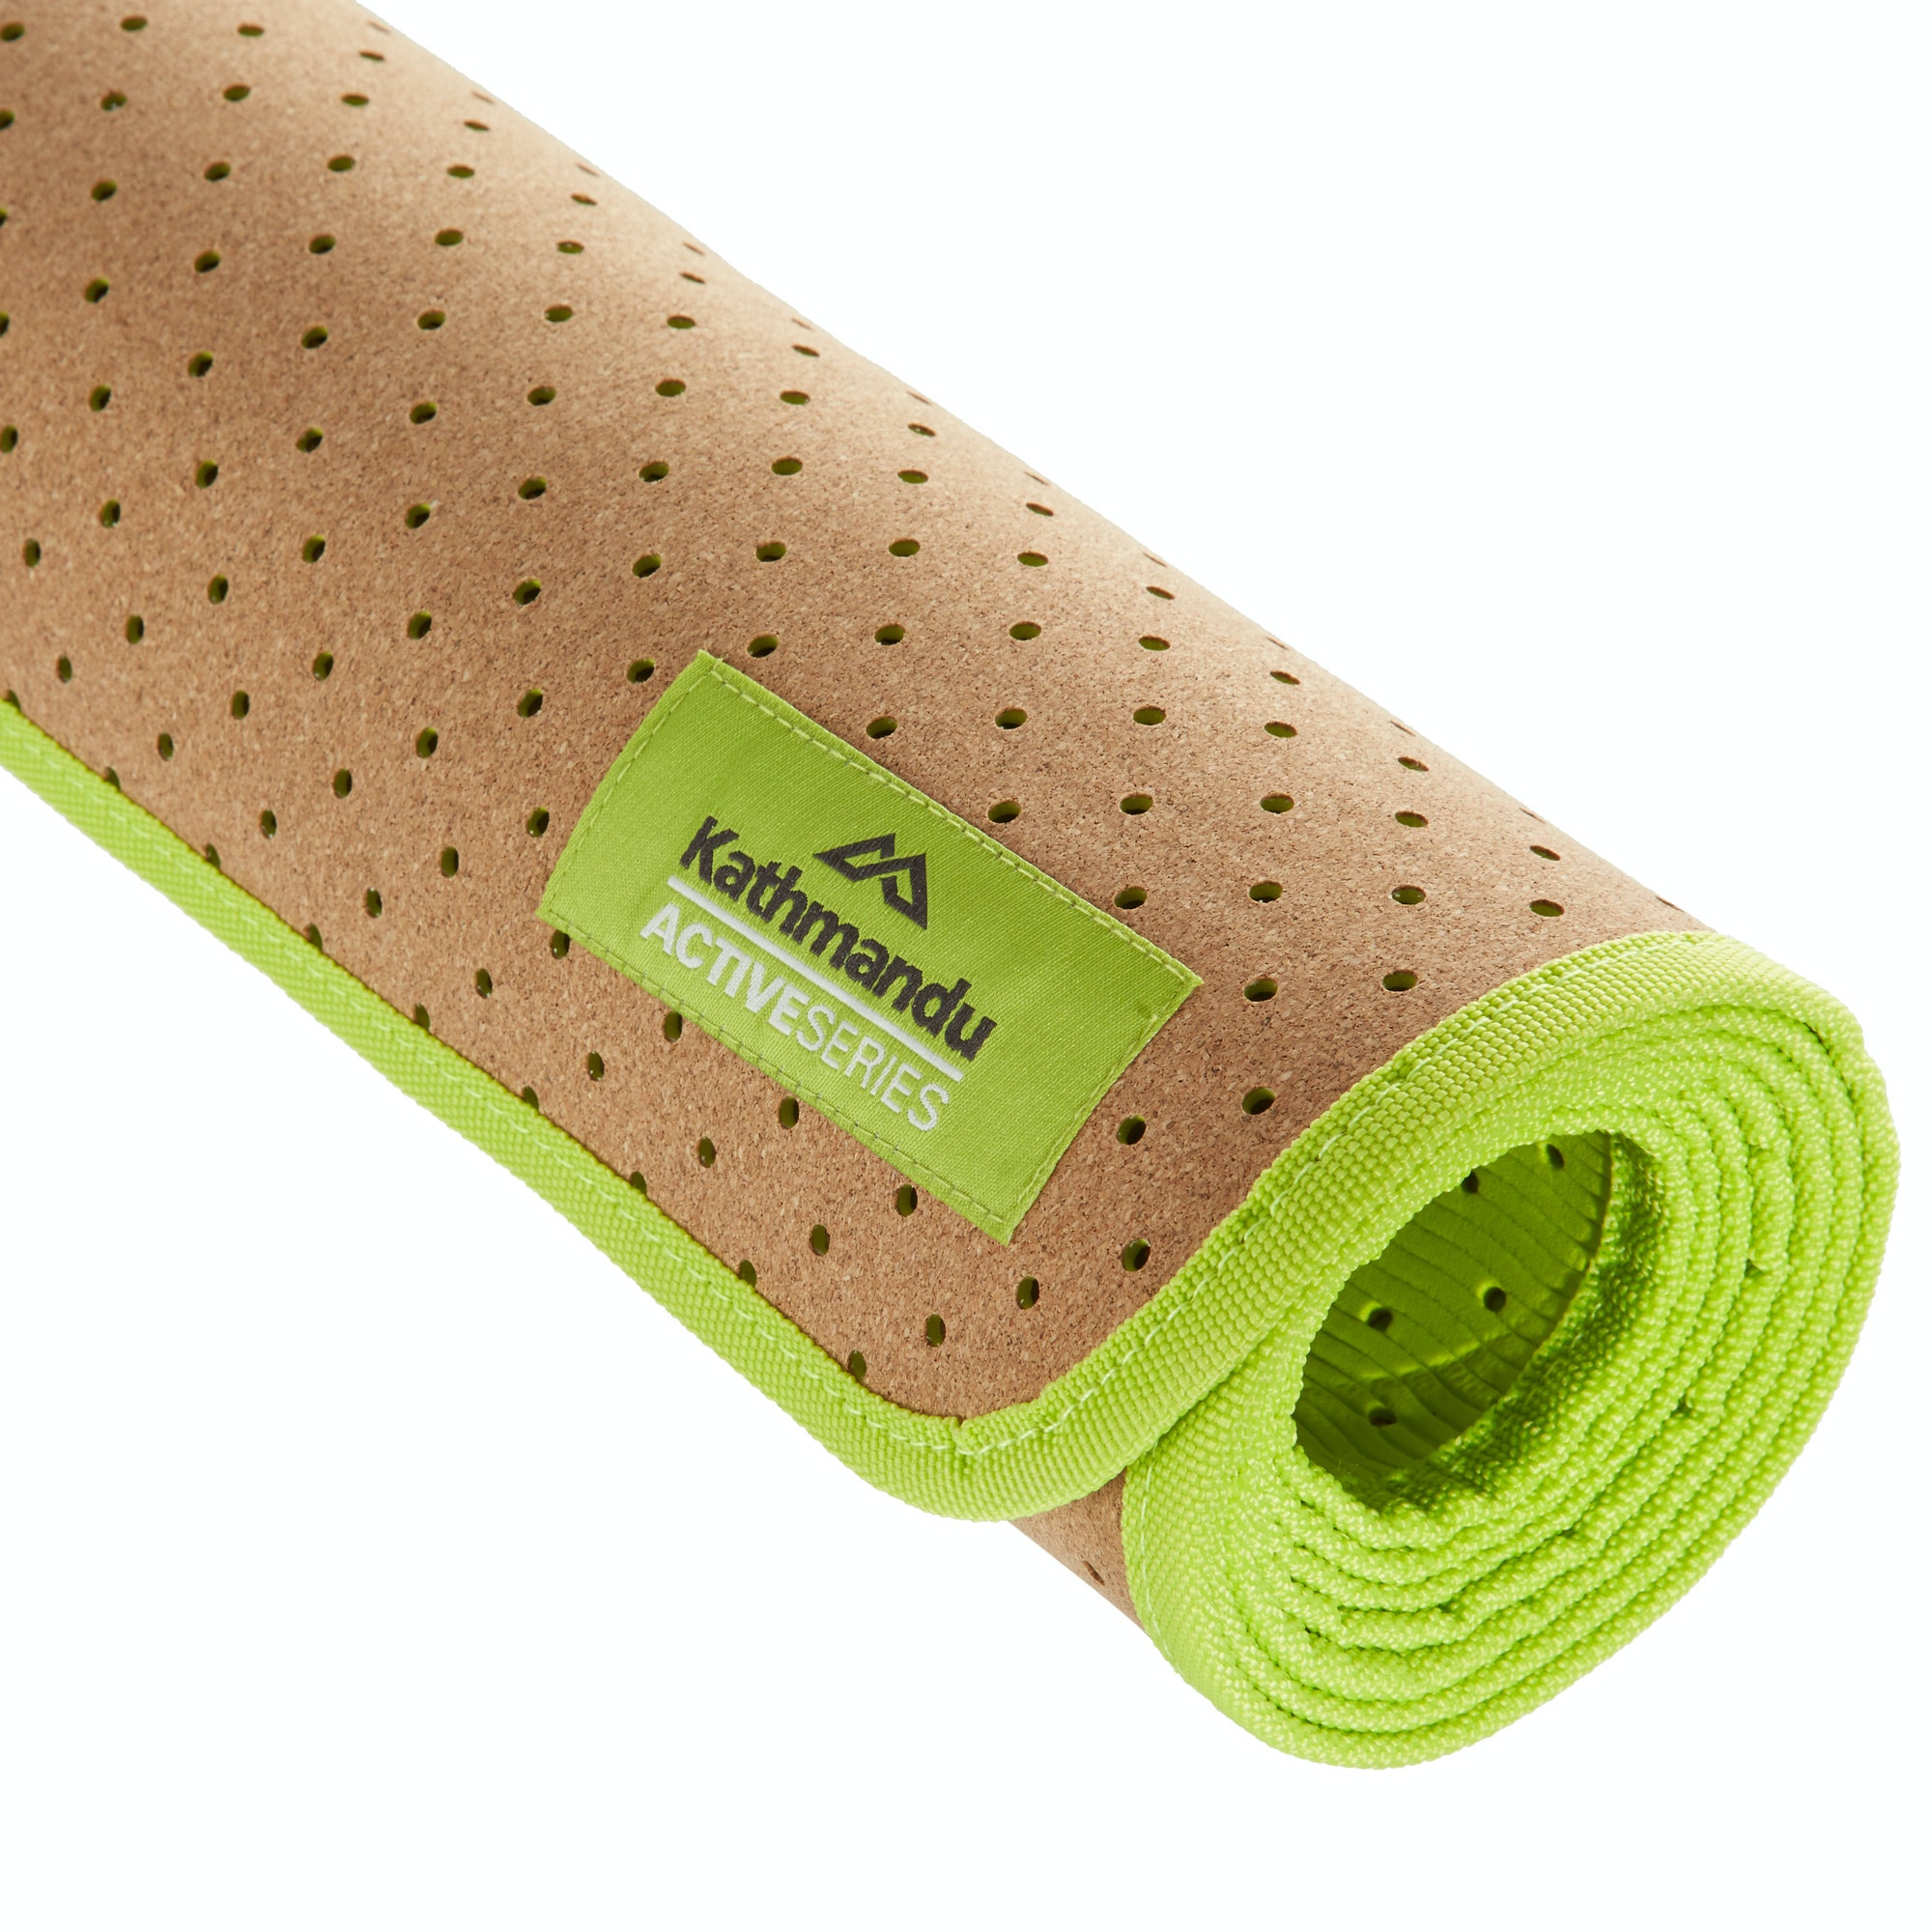 alibaba manufacturers cork com eva and quality interlocking showroom at high suppliers mats mat